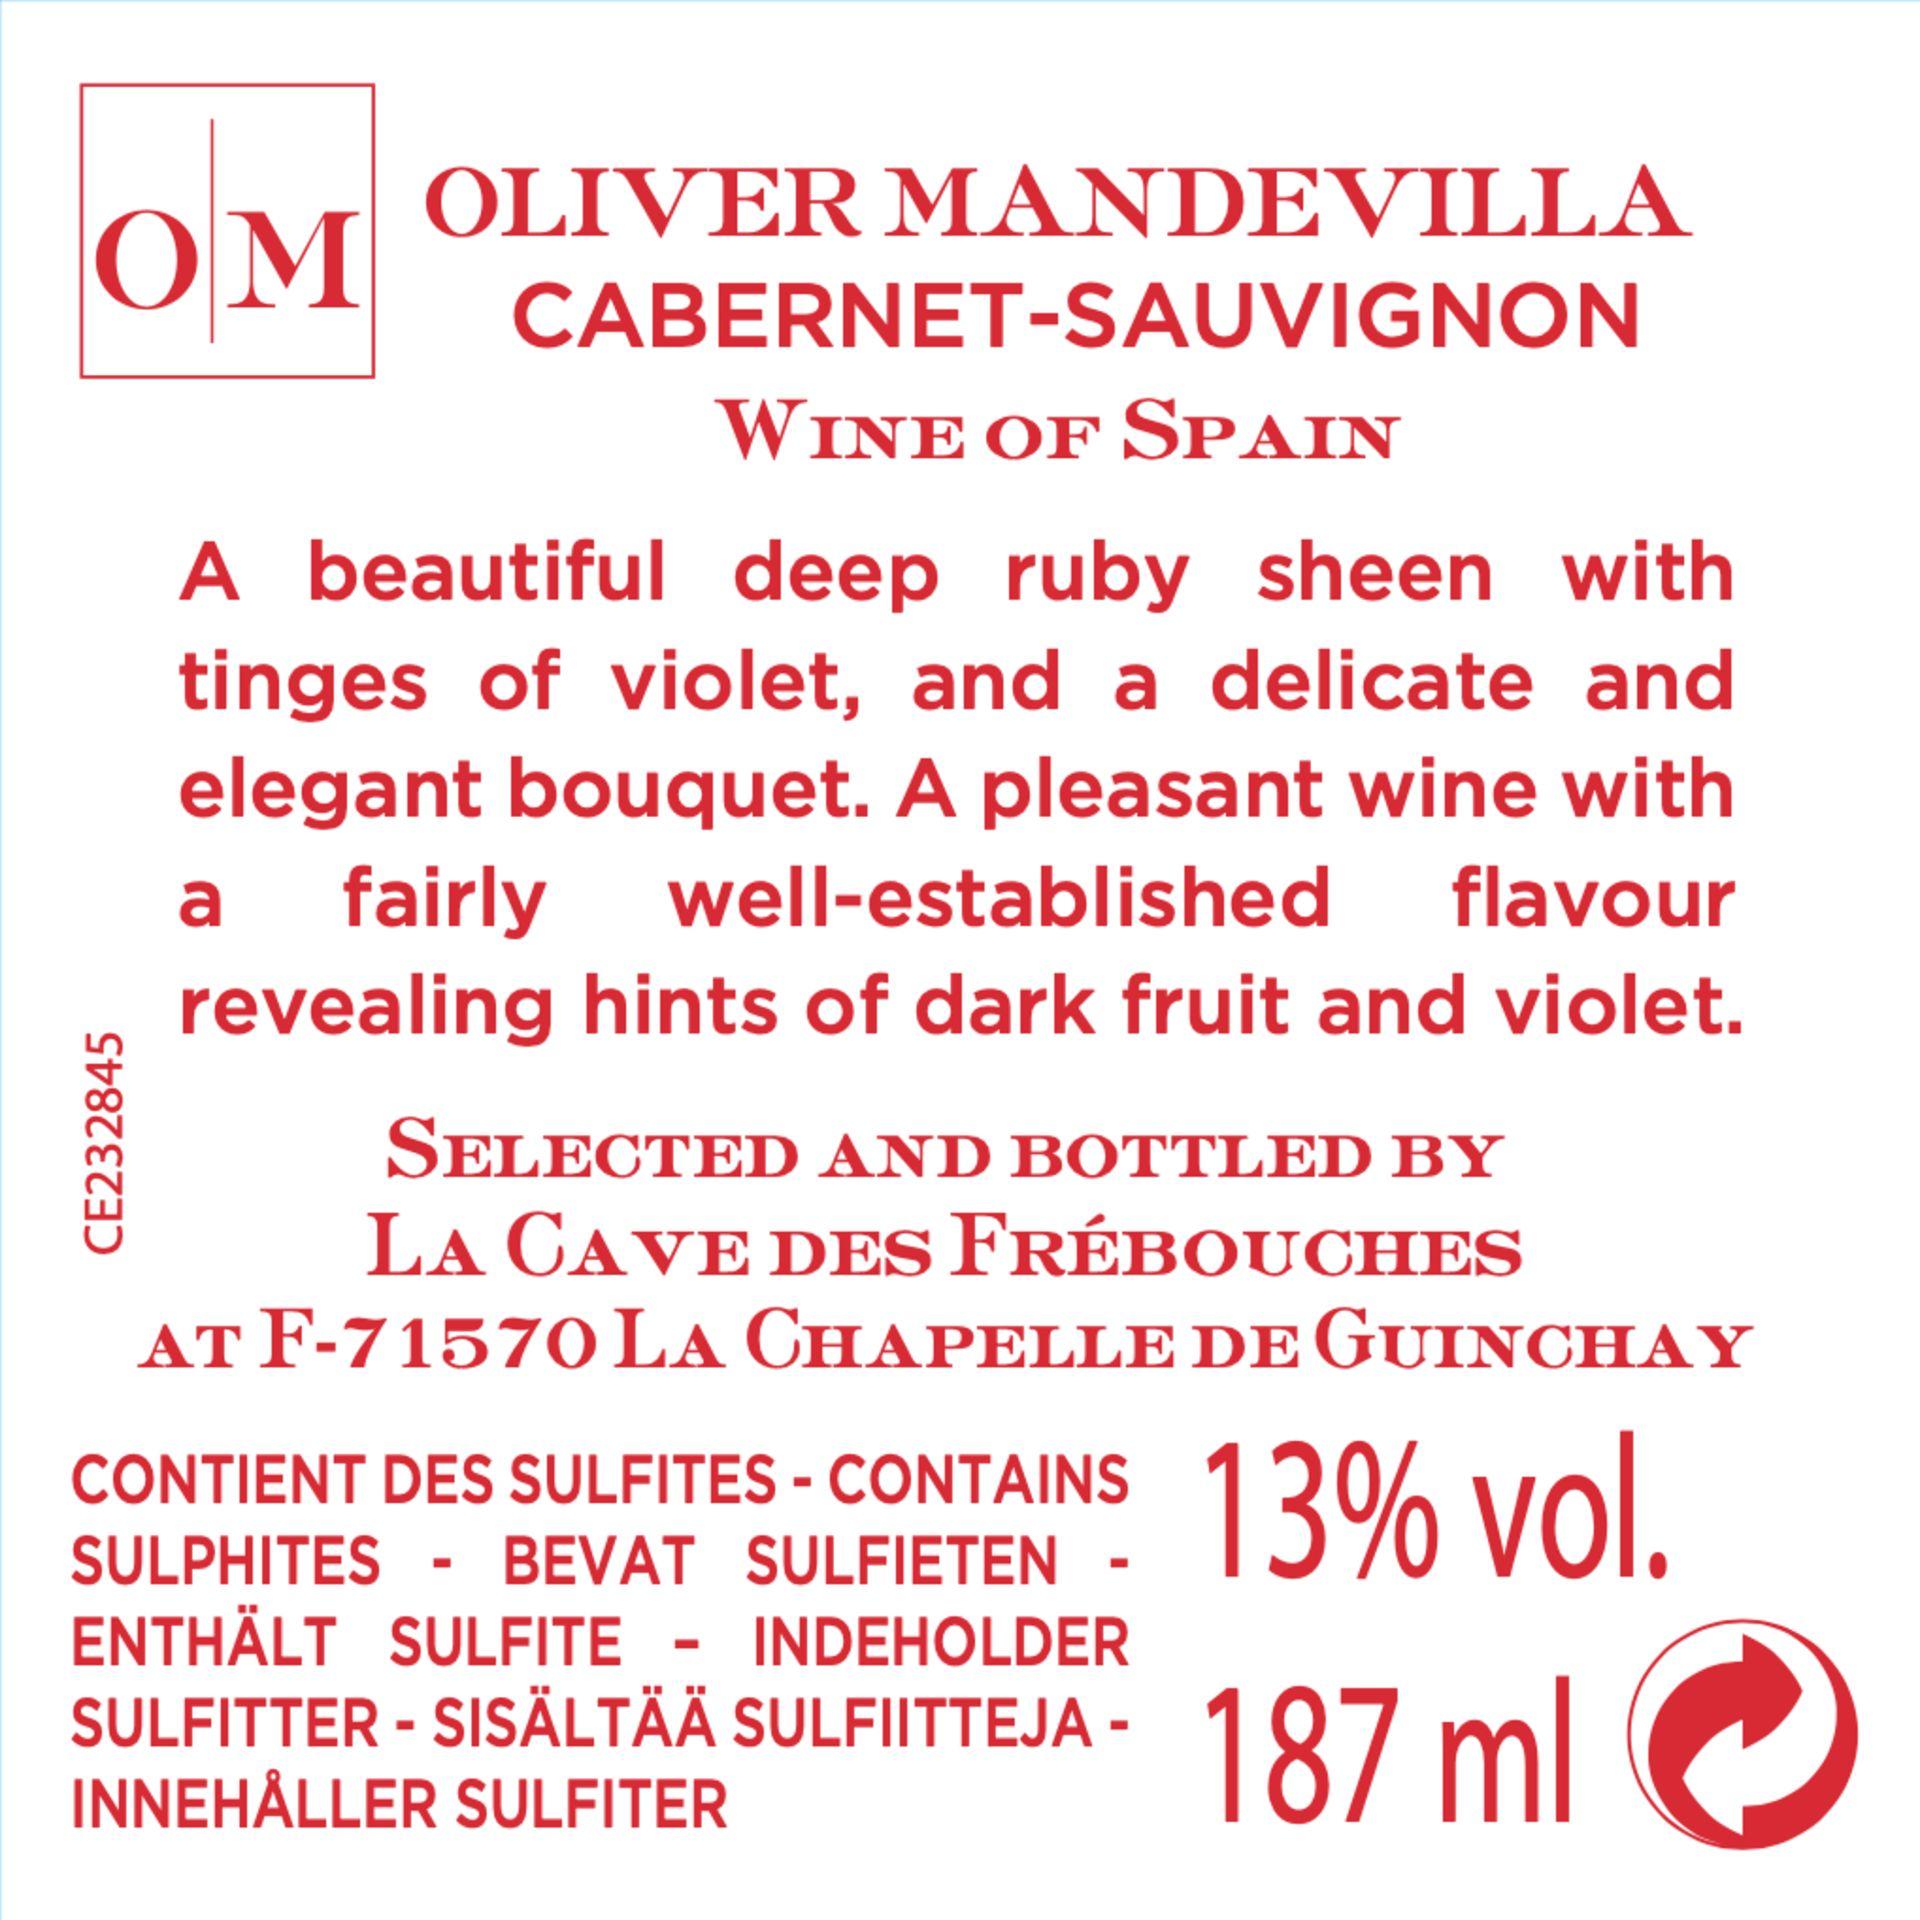 1 x Pallet of Oliver Mandevilla Cabernet-Sauvignon - Image 4 of 4